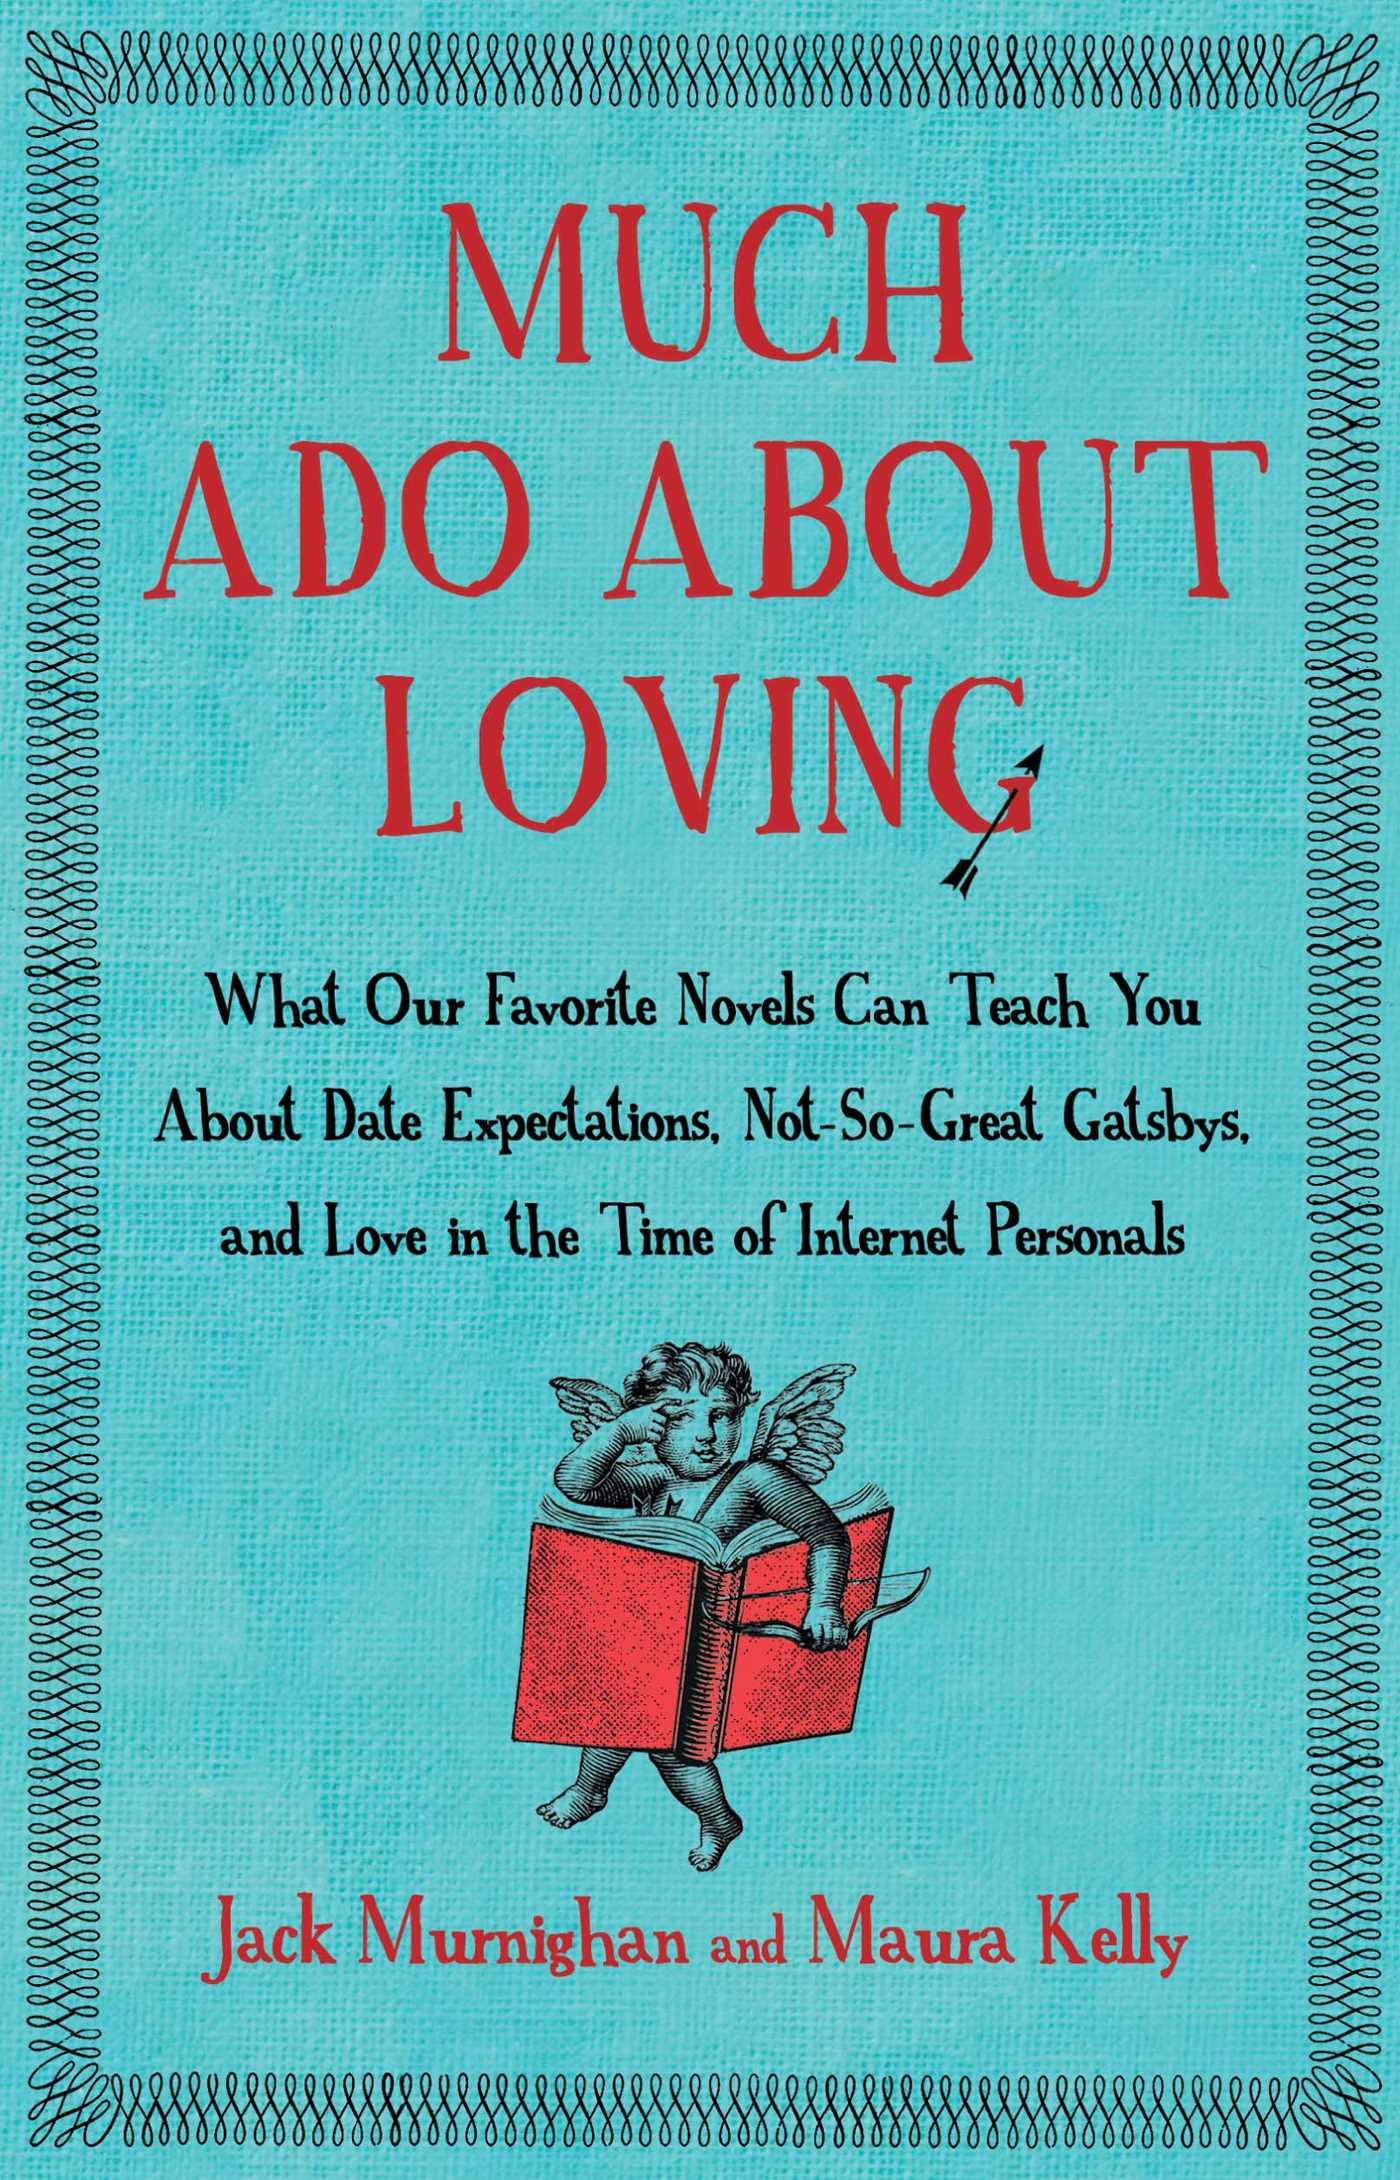 Much ado about loving 9781451621259 hr